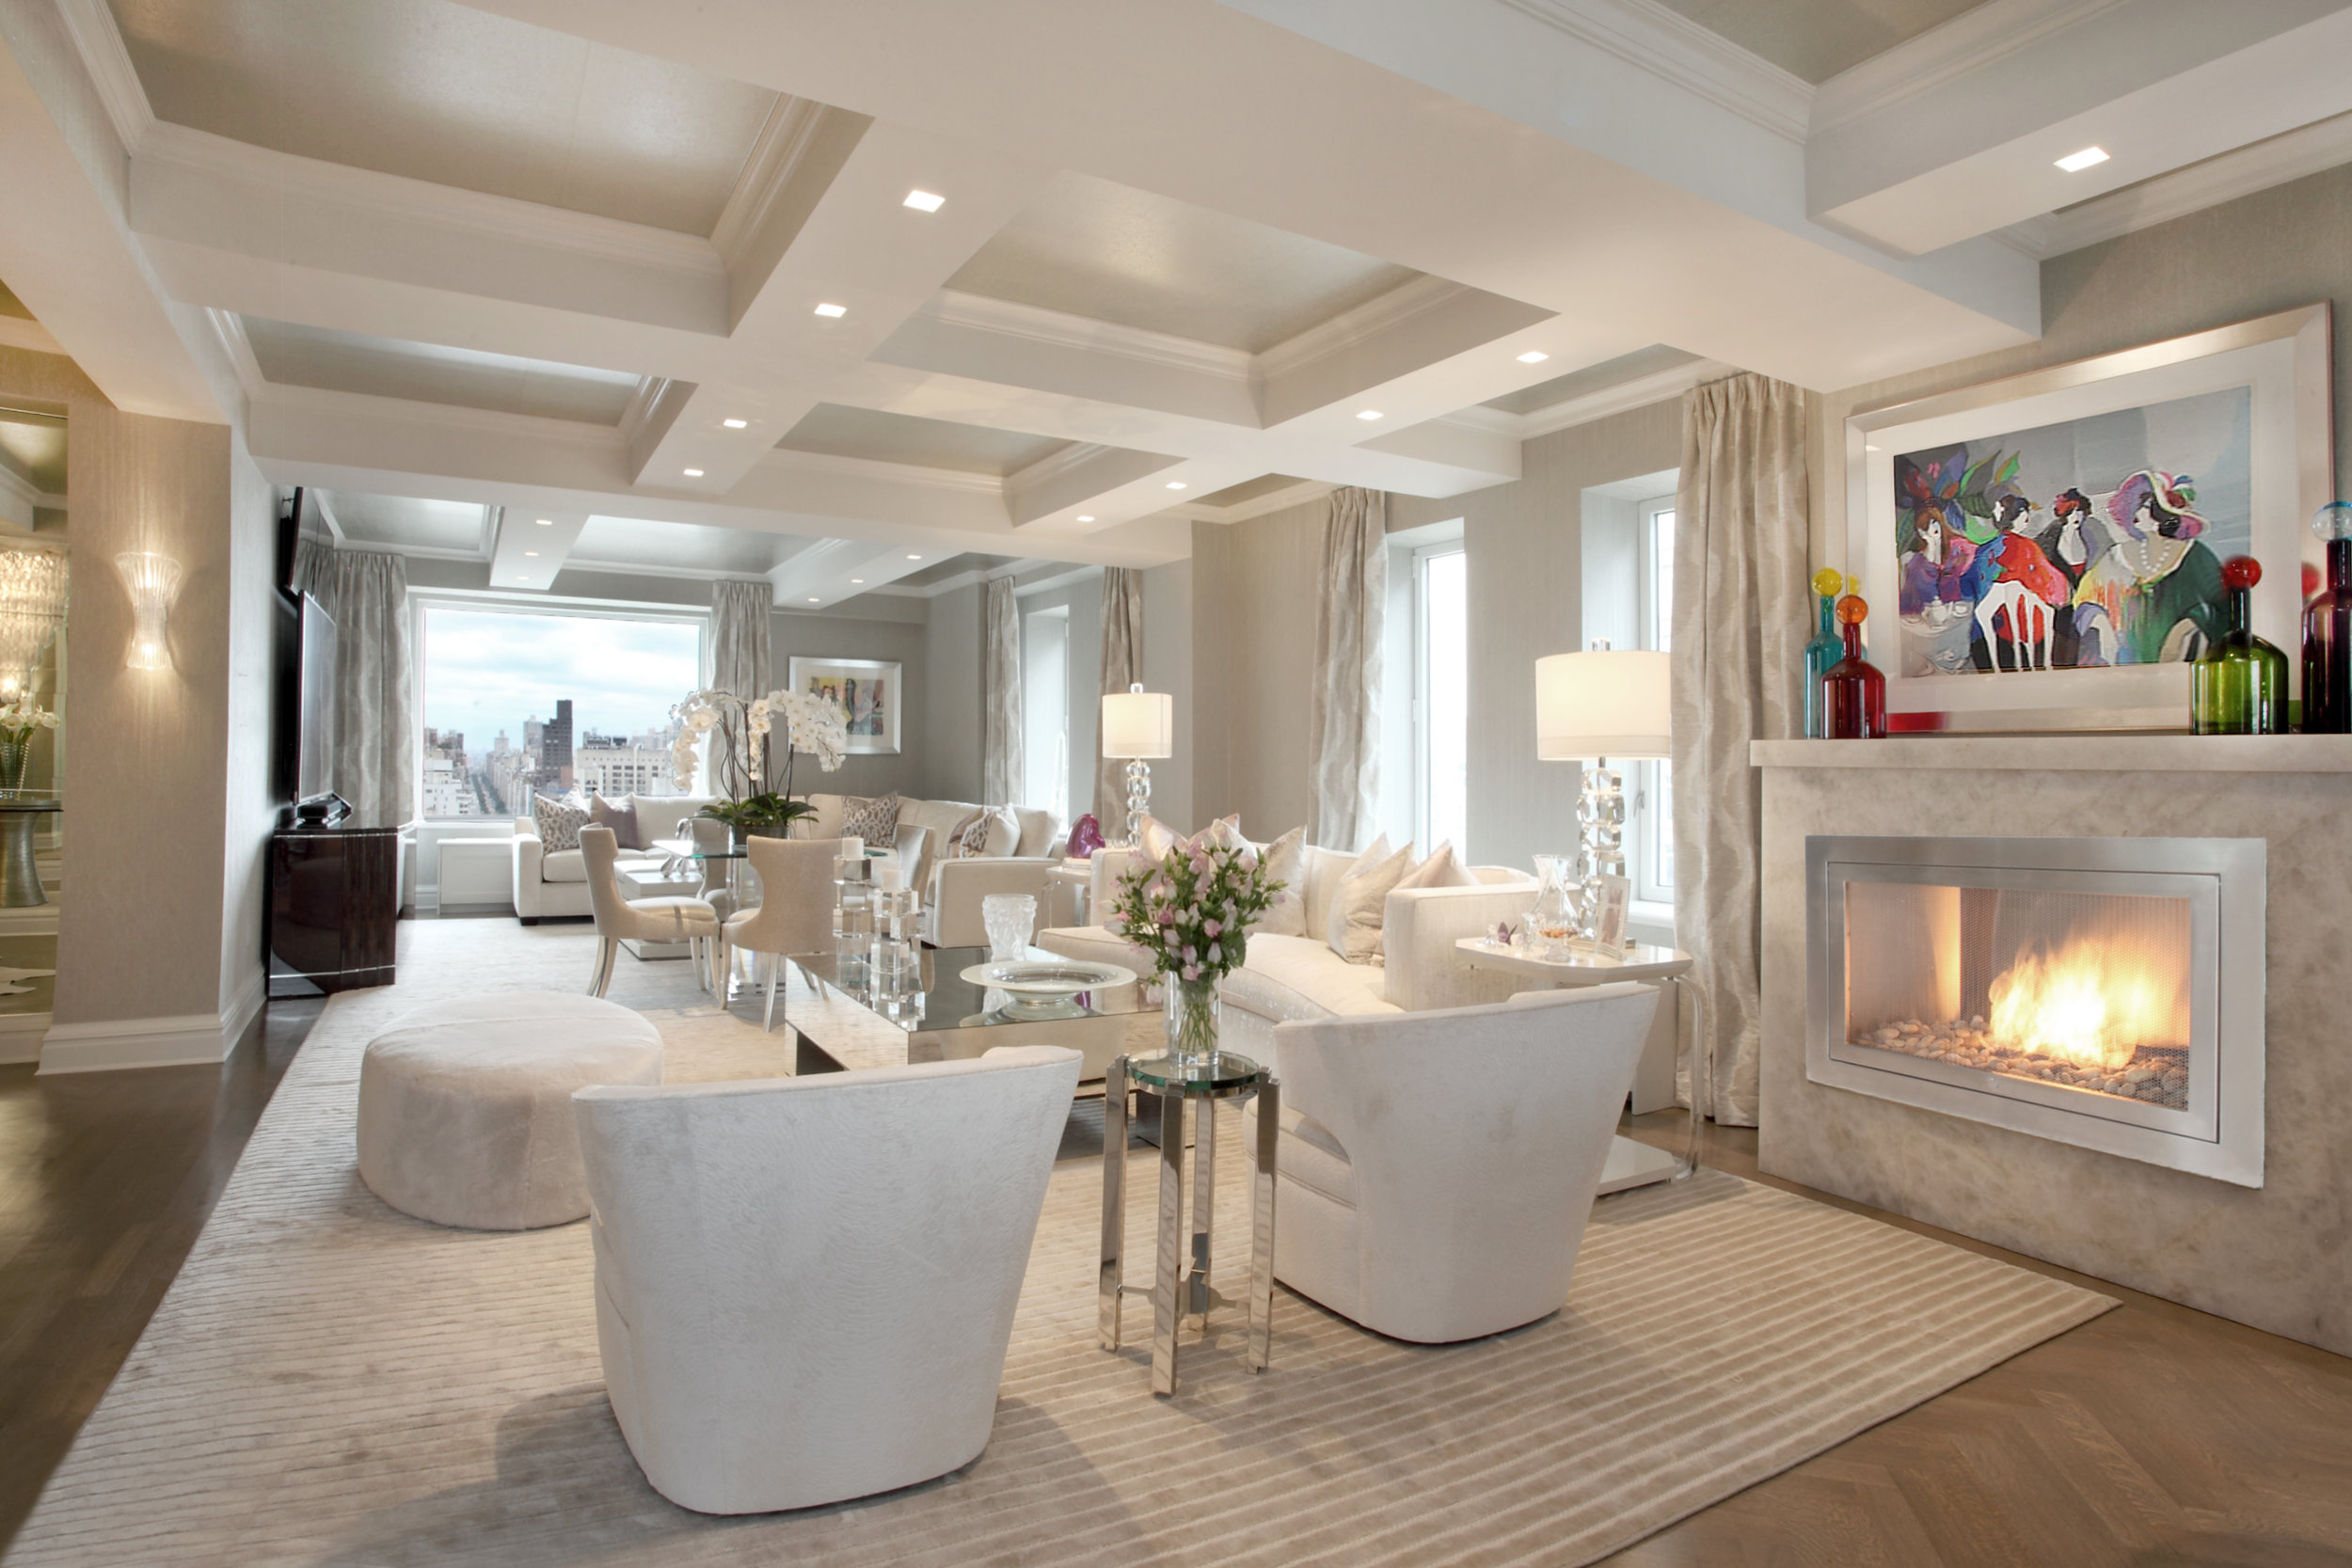 Designer: Patricia Bonis Interiors | Contractor: Stanley Michael & Co Inc.